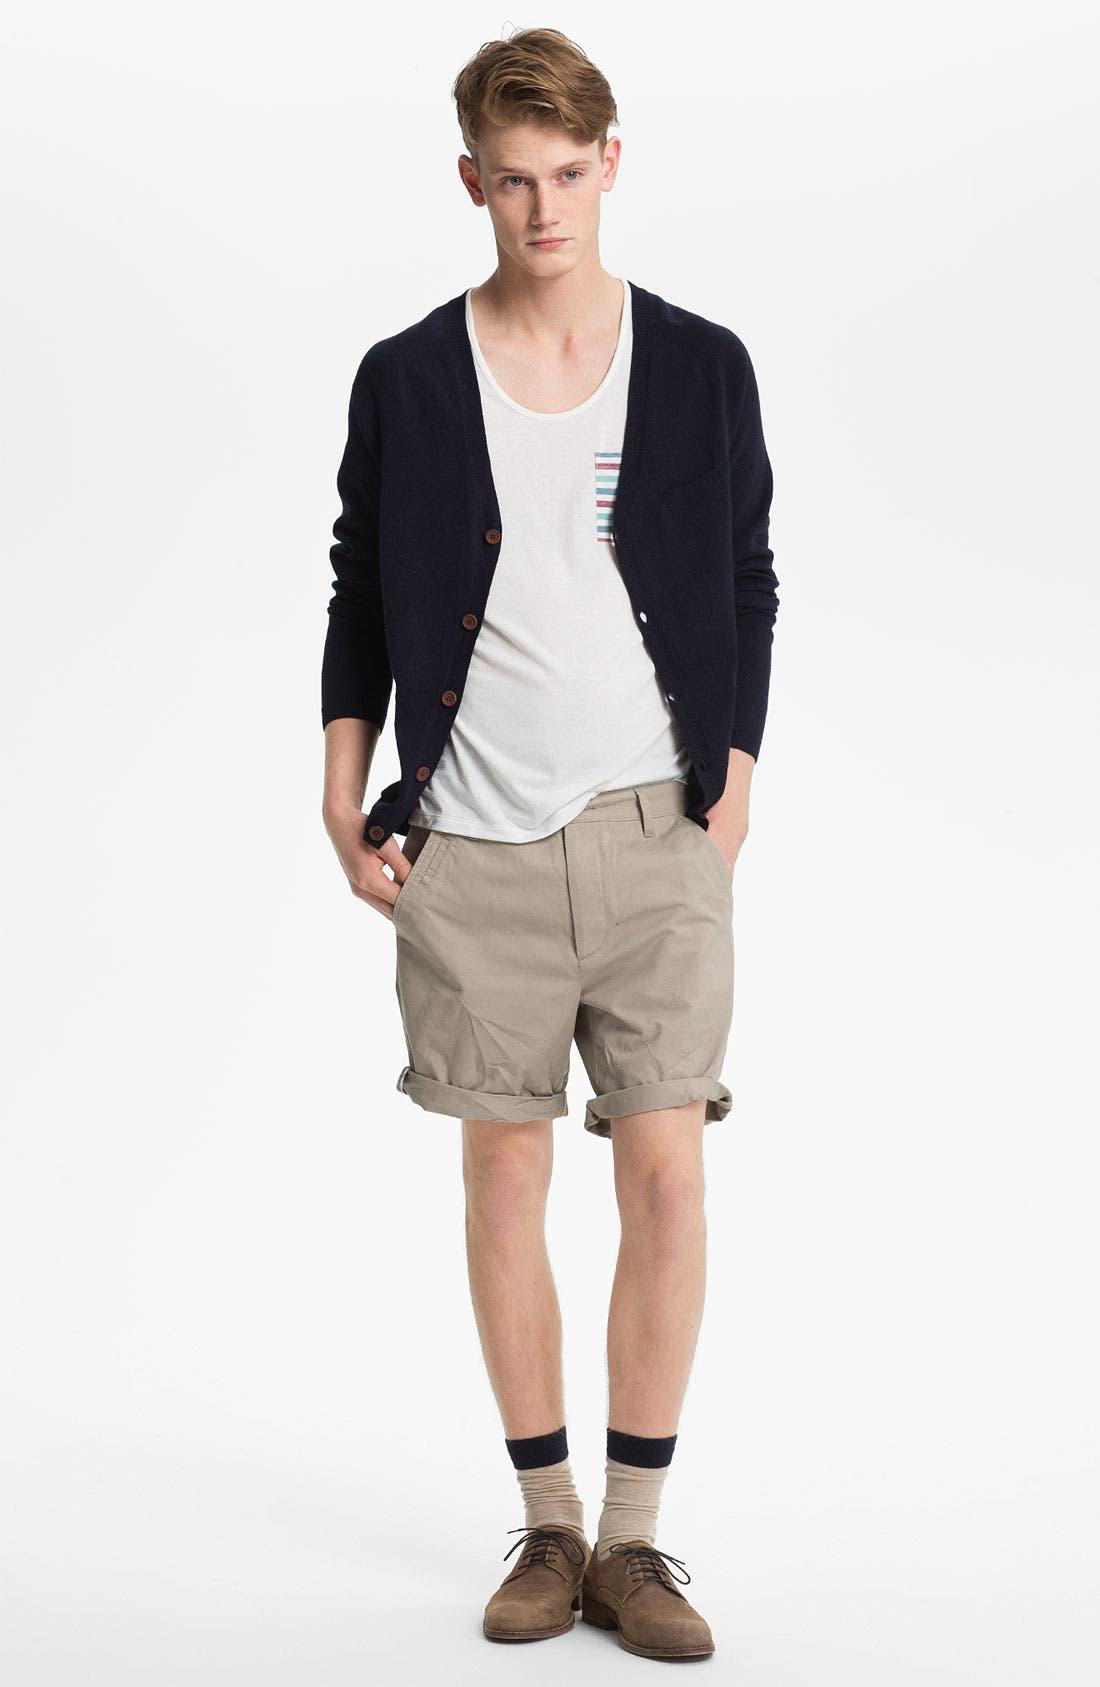 Alternate Image 1 Selected - Topman Cardigan, Tank Top & Shorts